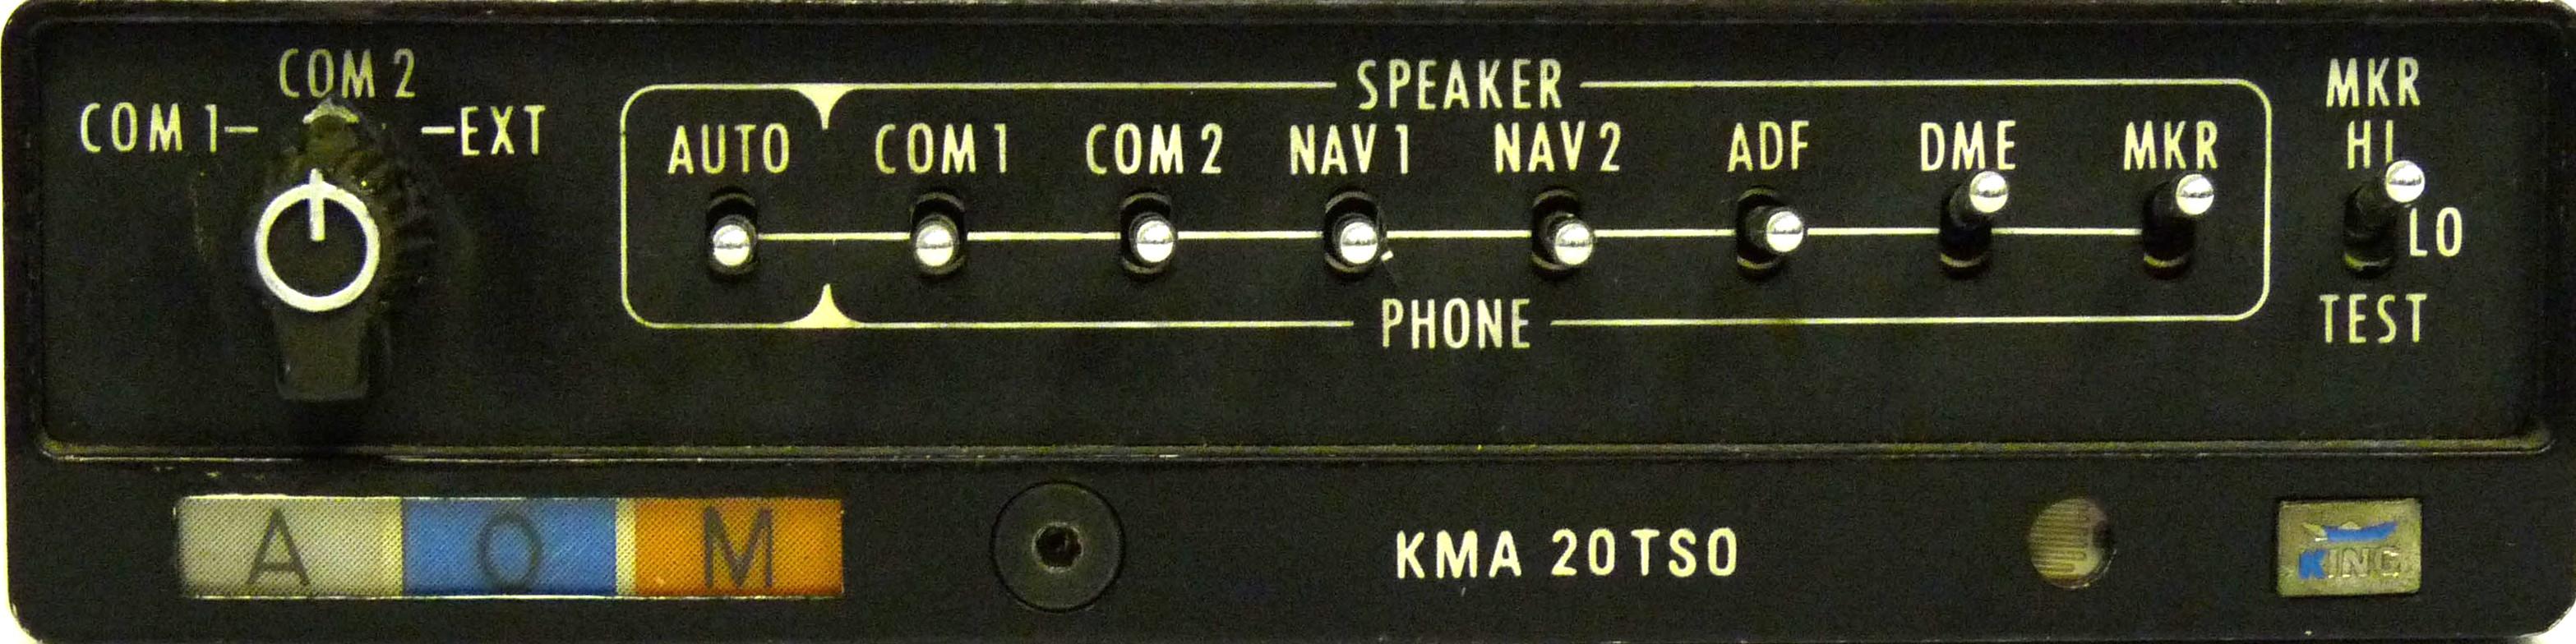 building a physical kma20 panel rh medspx fr KMA 20 TSO Manual KMA 26 Audio Panel Wiring